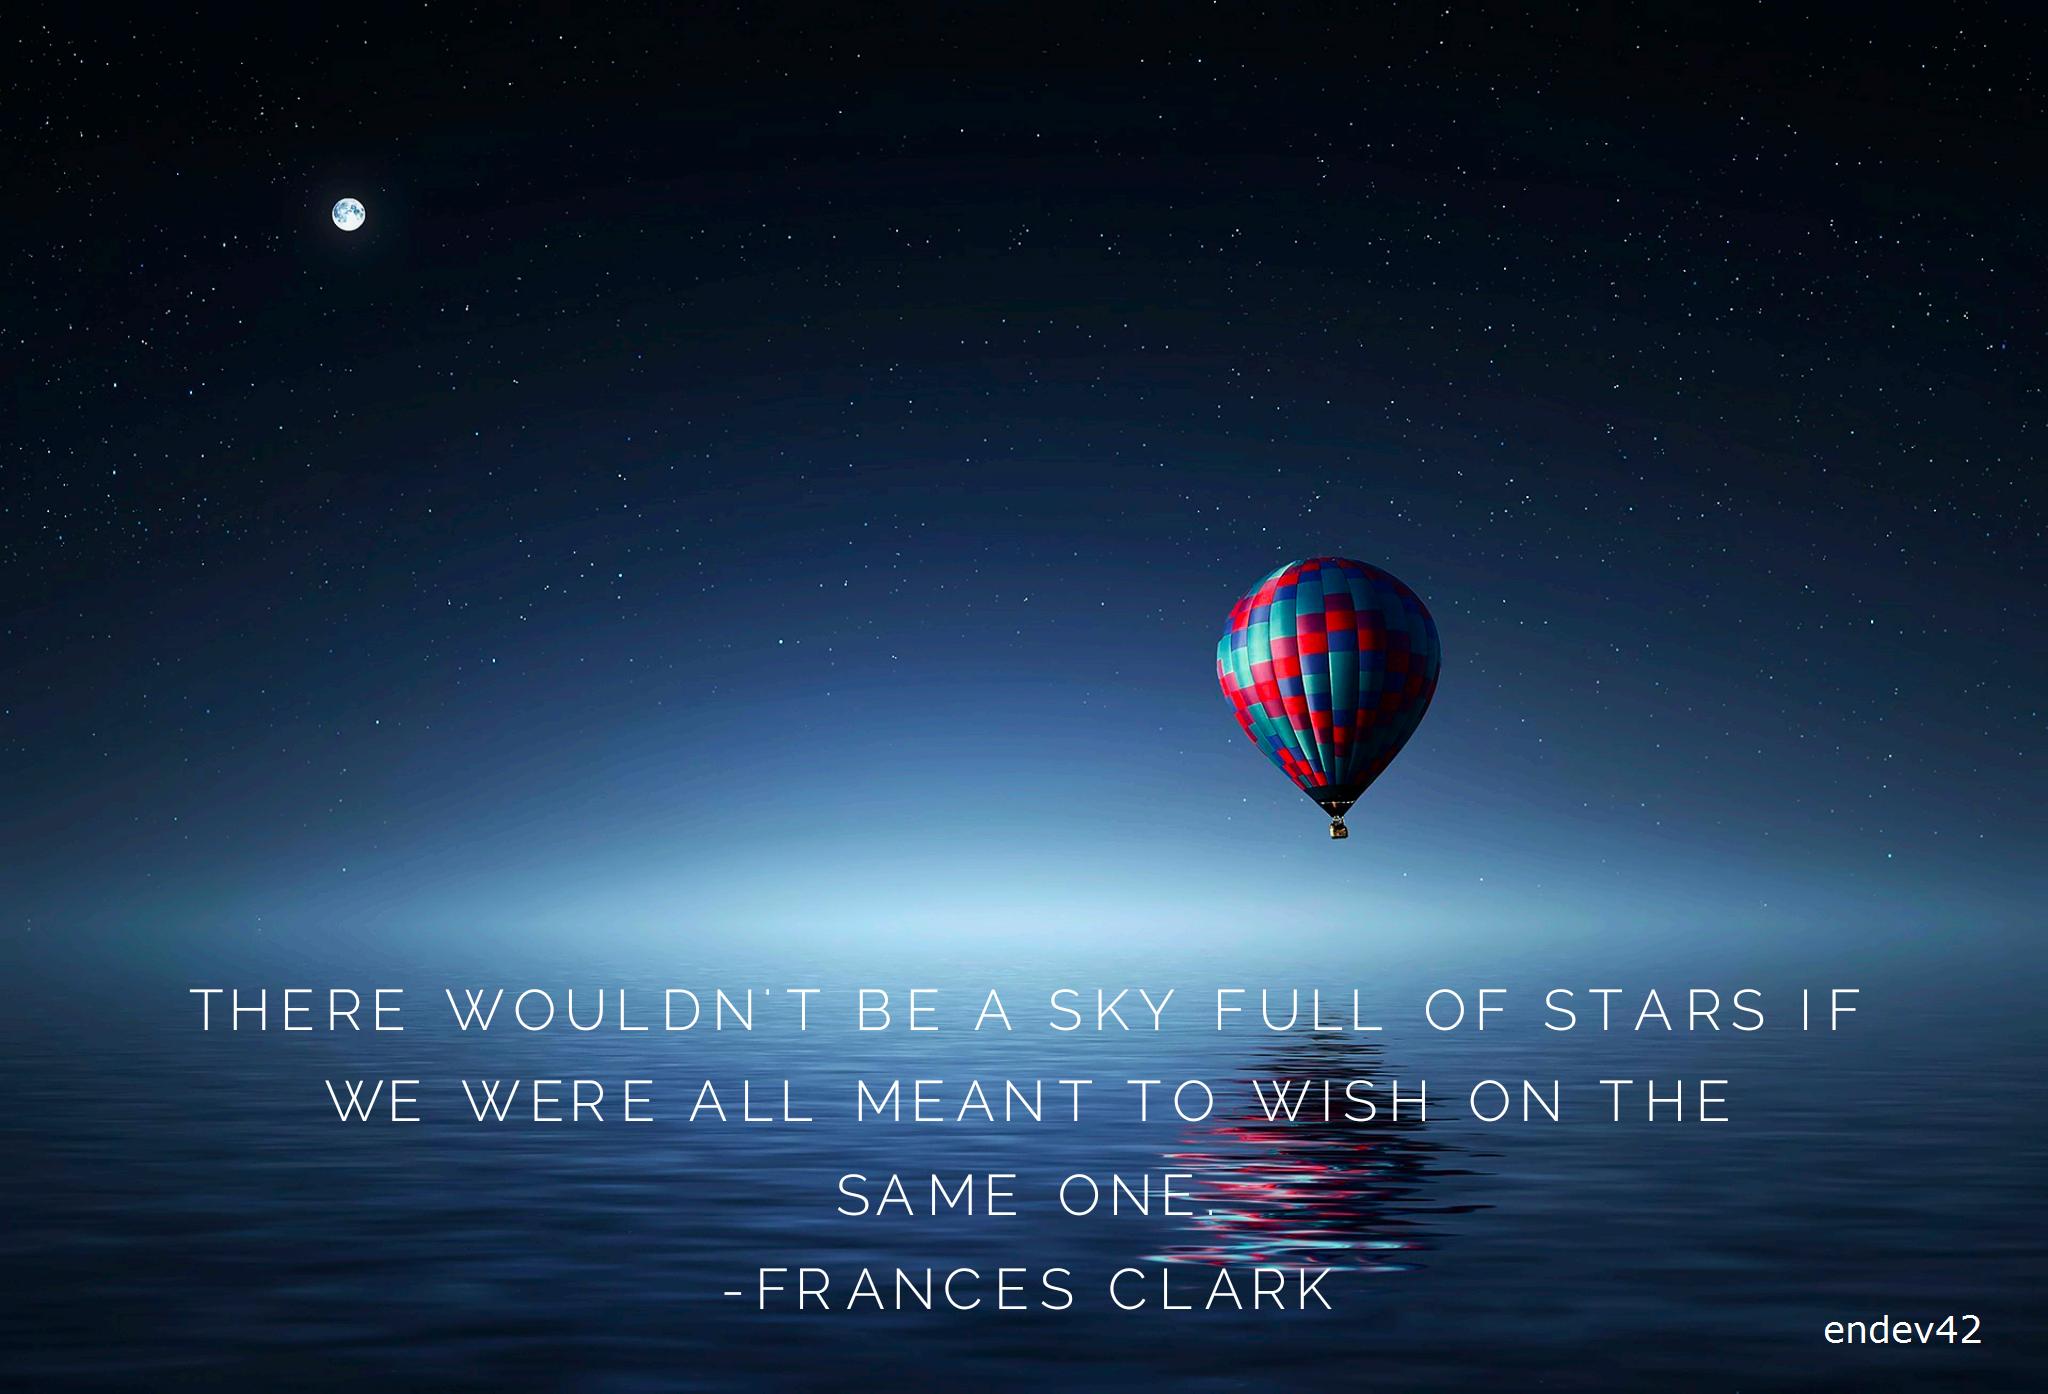 Frances Clark